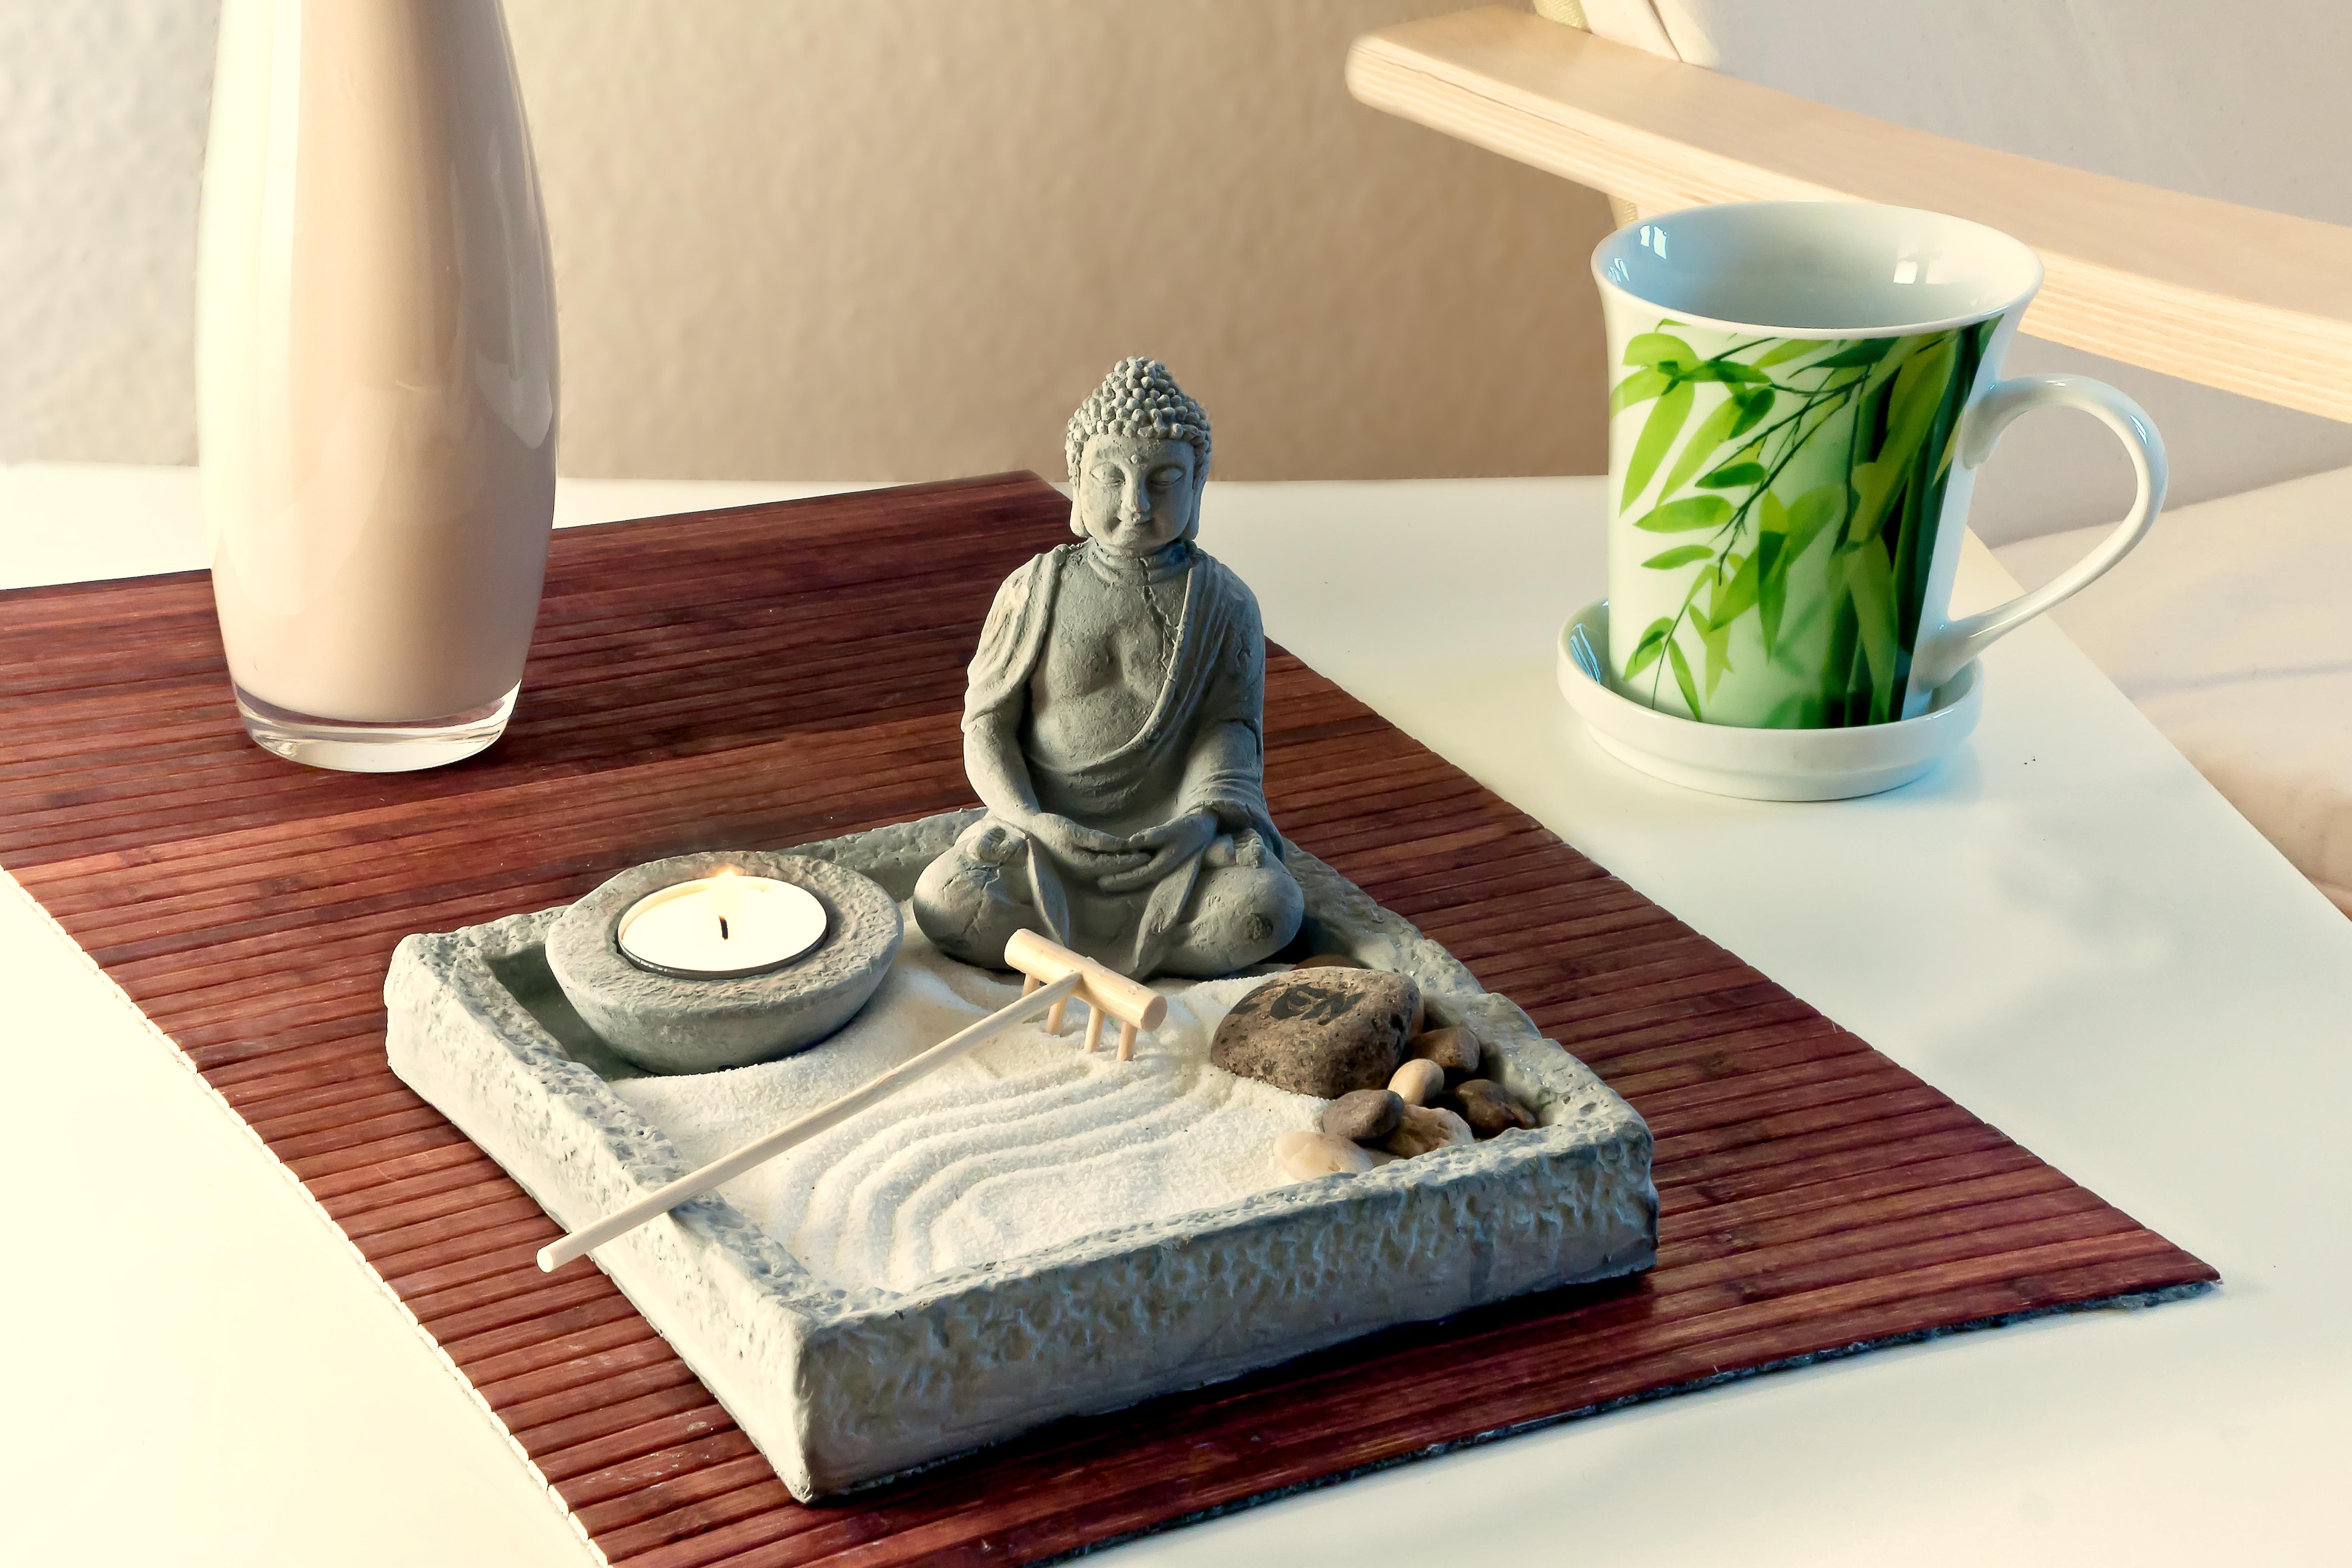 free images table smoke statue ceramic meditate. Black Bedroom Furniture Sets. Home Design Ideas